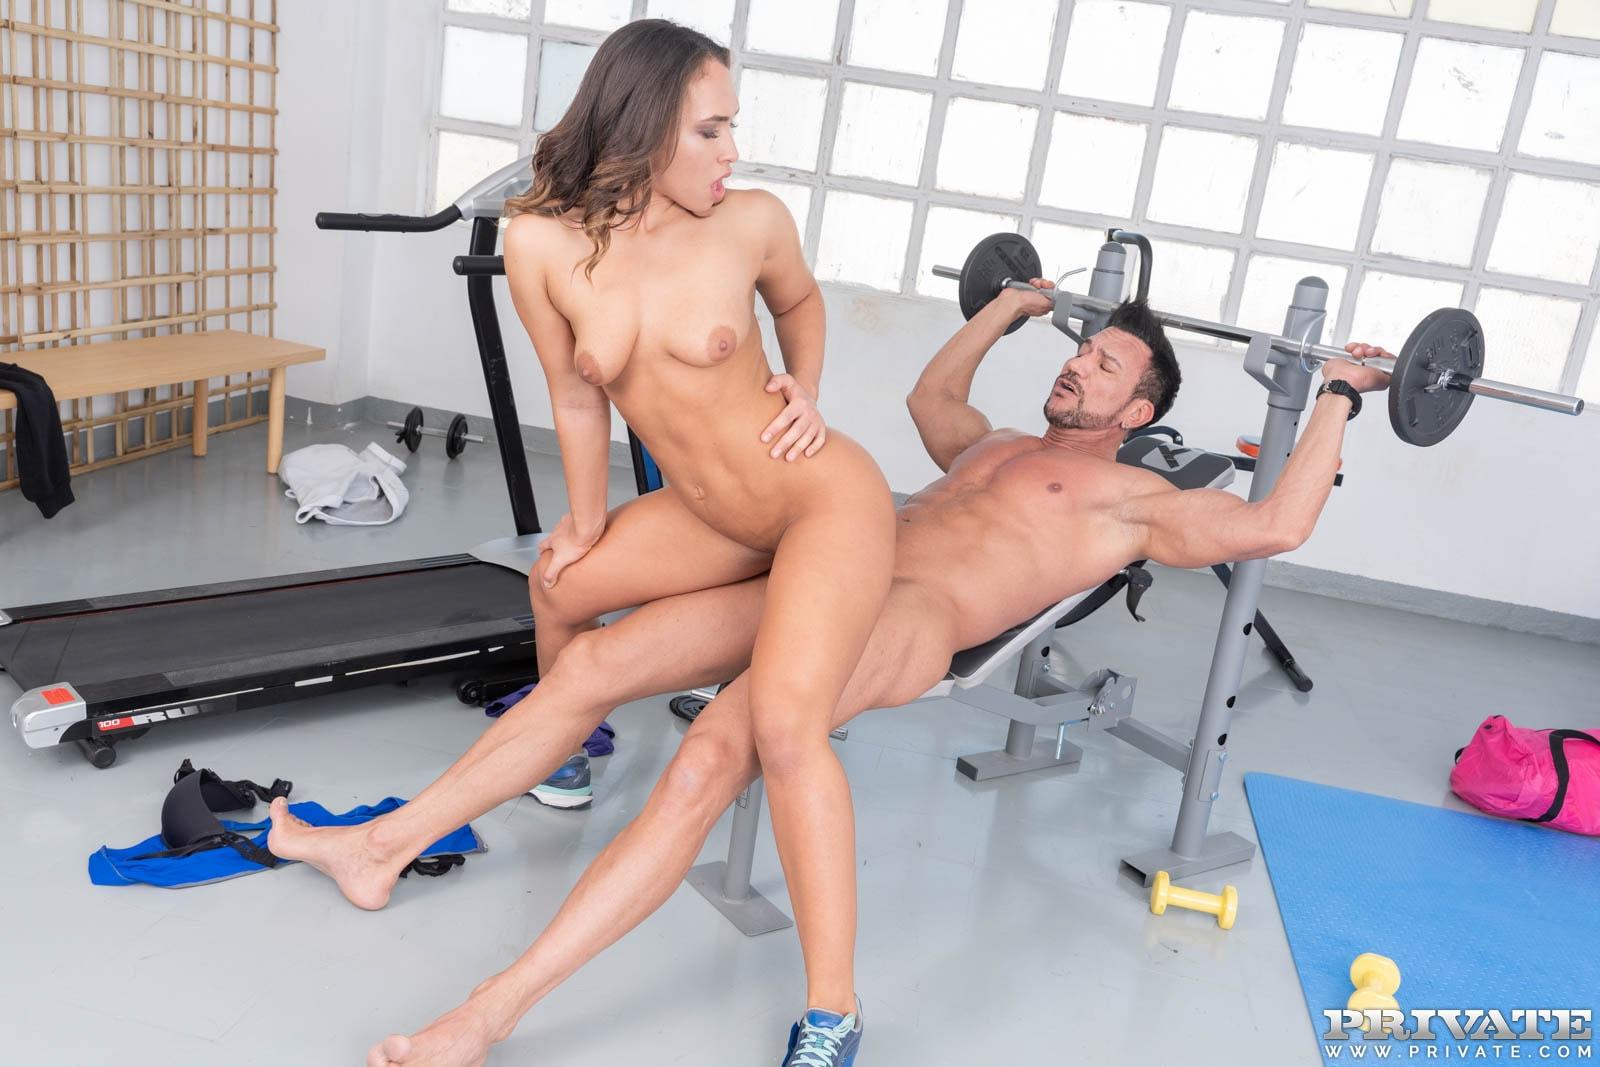 Free download xxx gay pics xxx gay gym gay porn gif